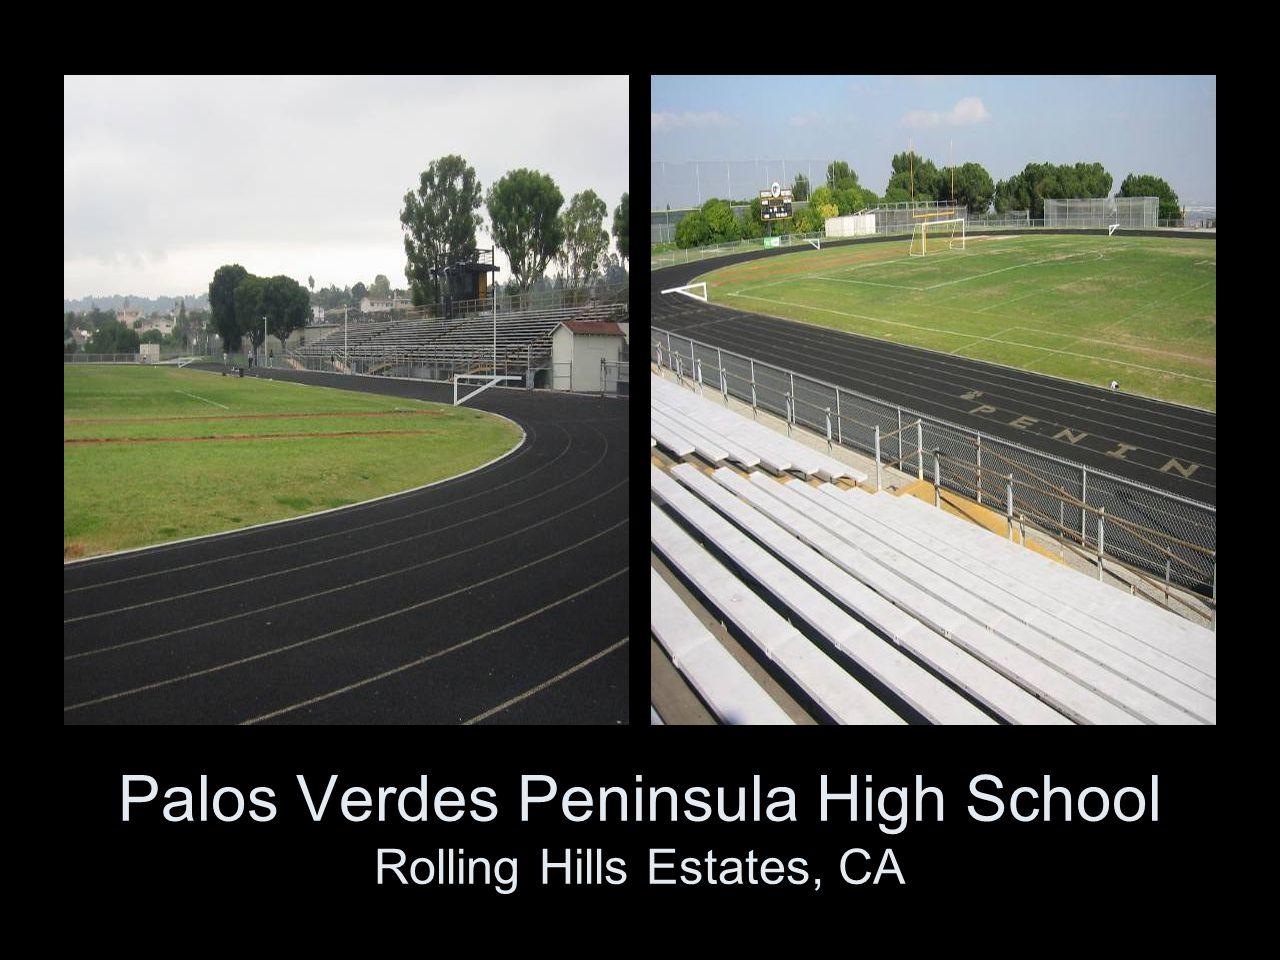 Palos Verdes Peninsula High School Rolling Hills Estates, CA